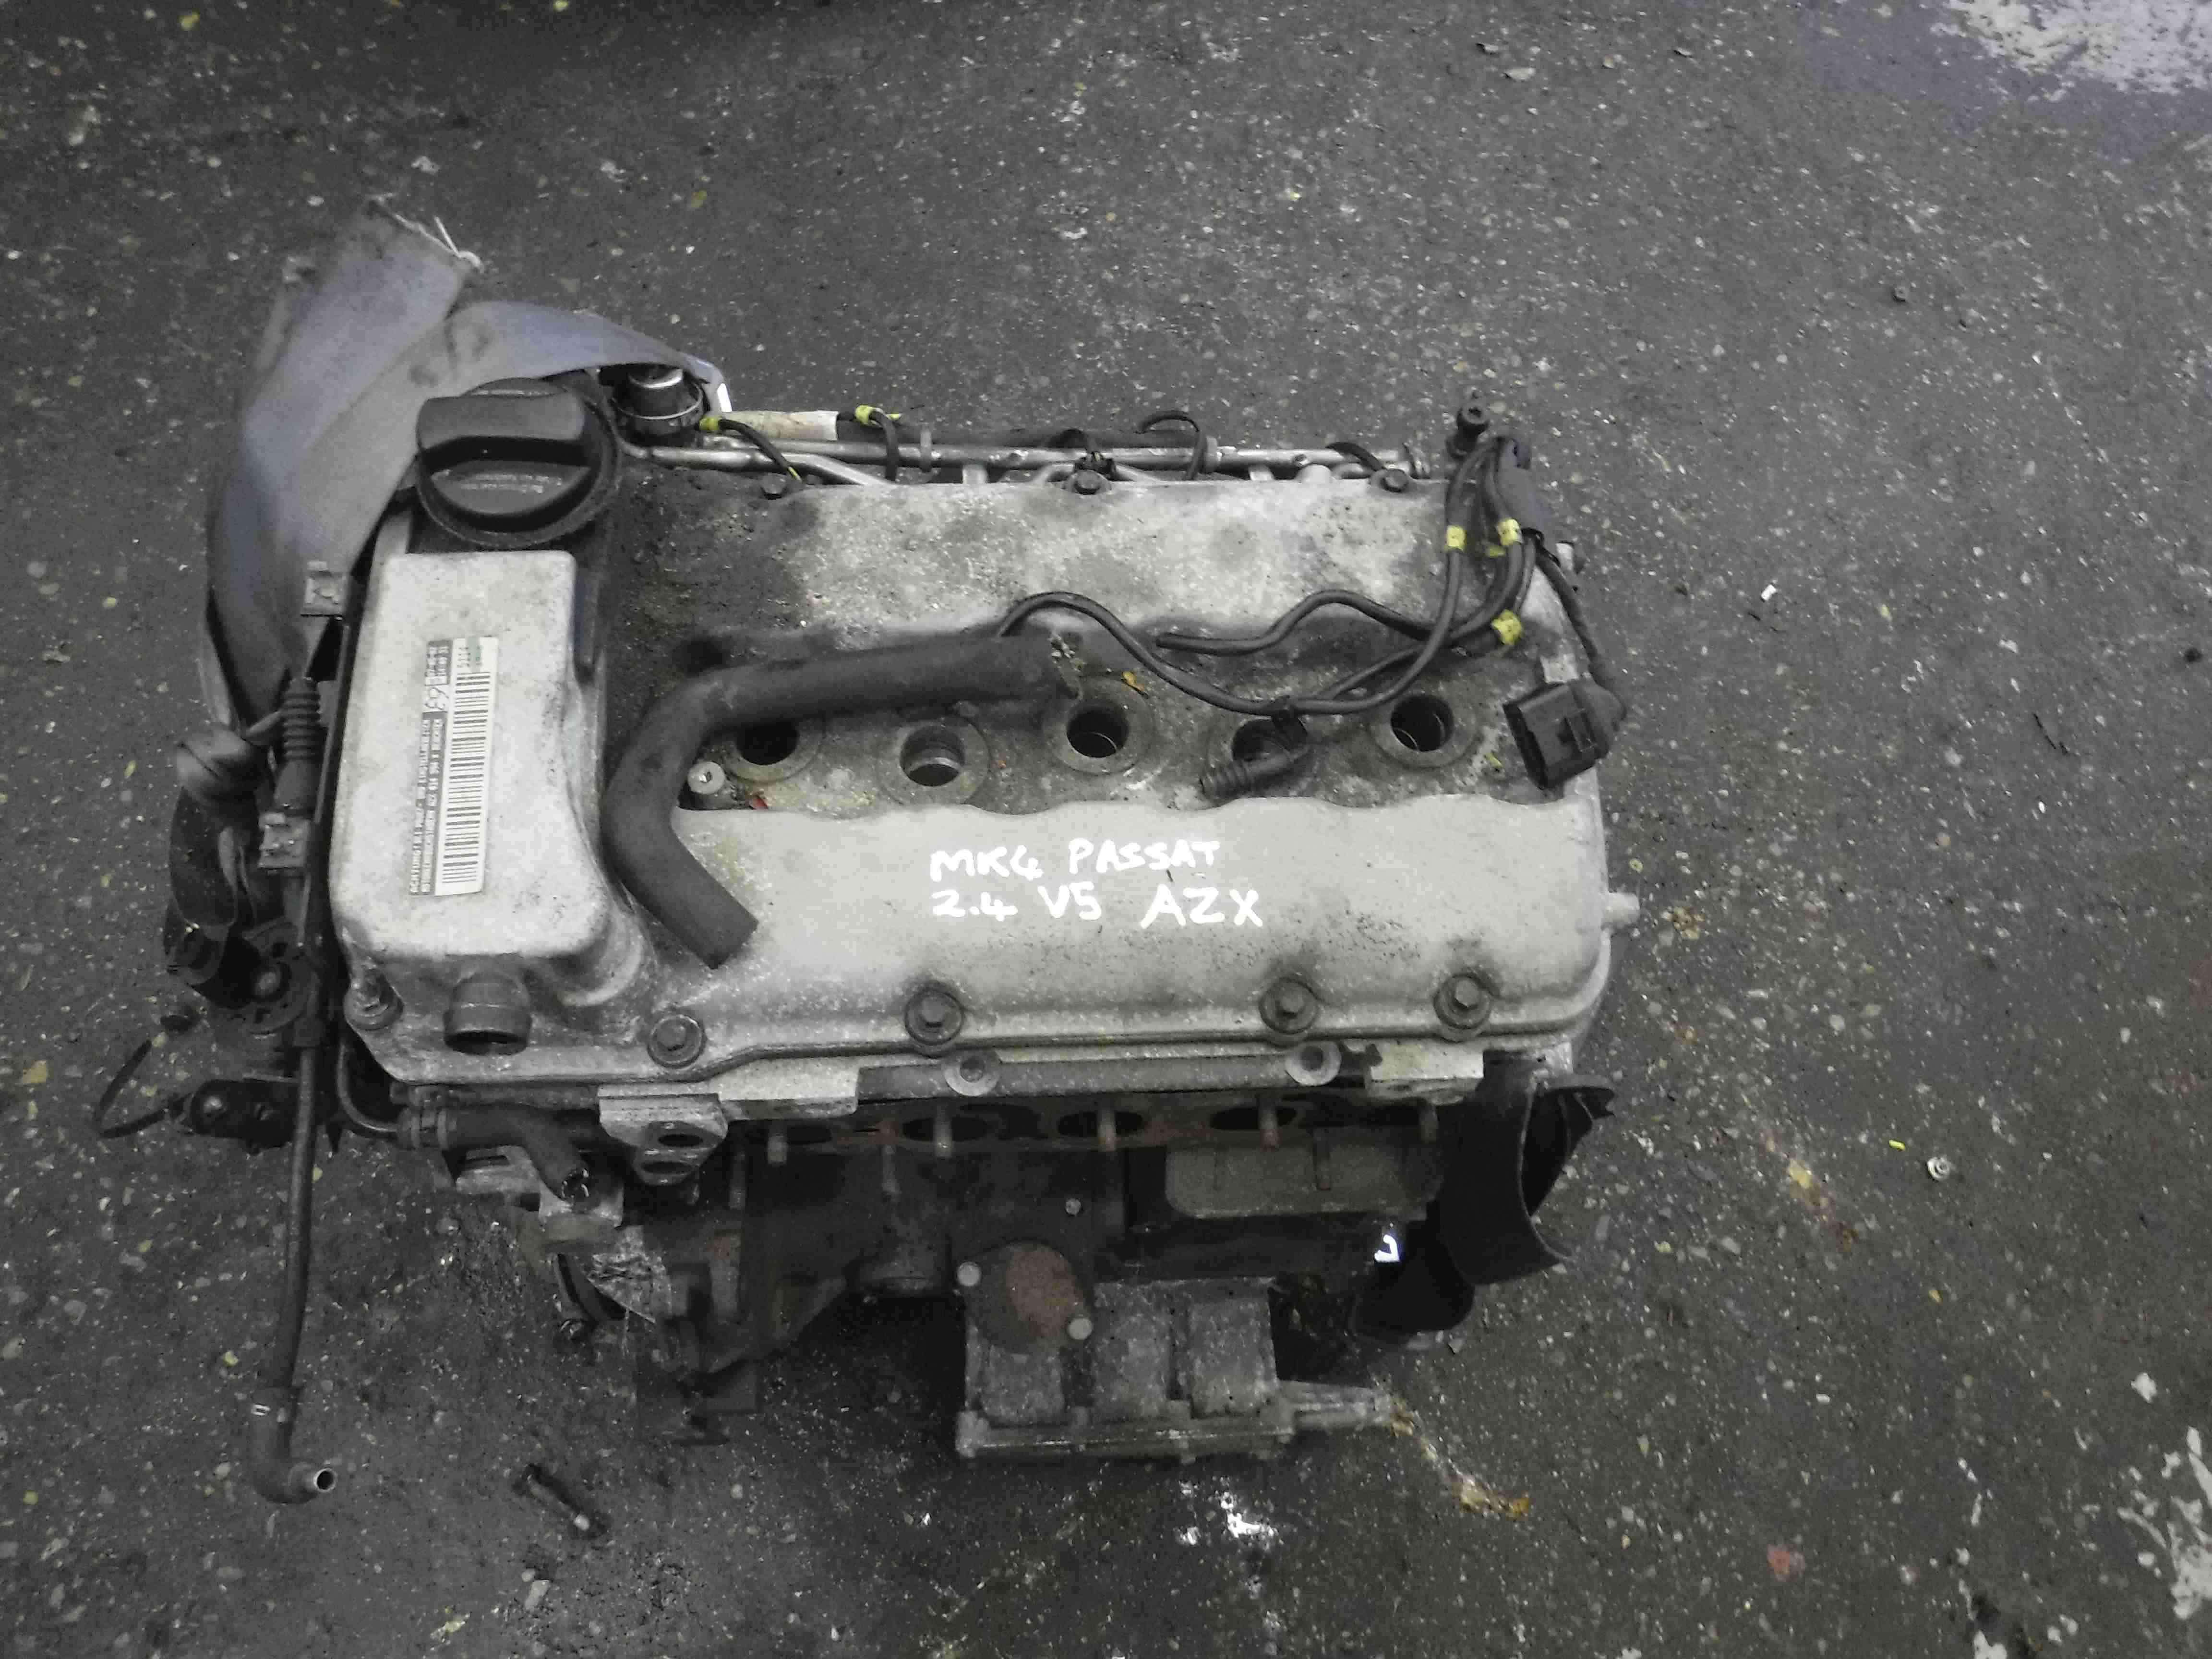 Volkswagen Passat 2001-2005 B5.5 2.3 V5 B5.5 Engine AZX